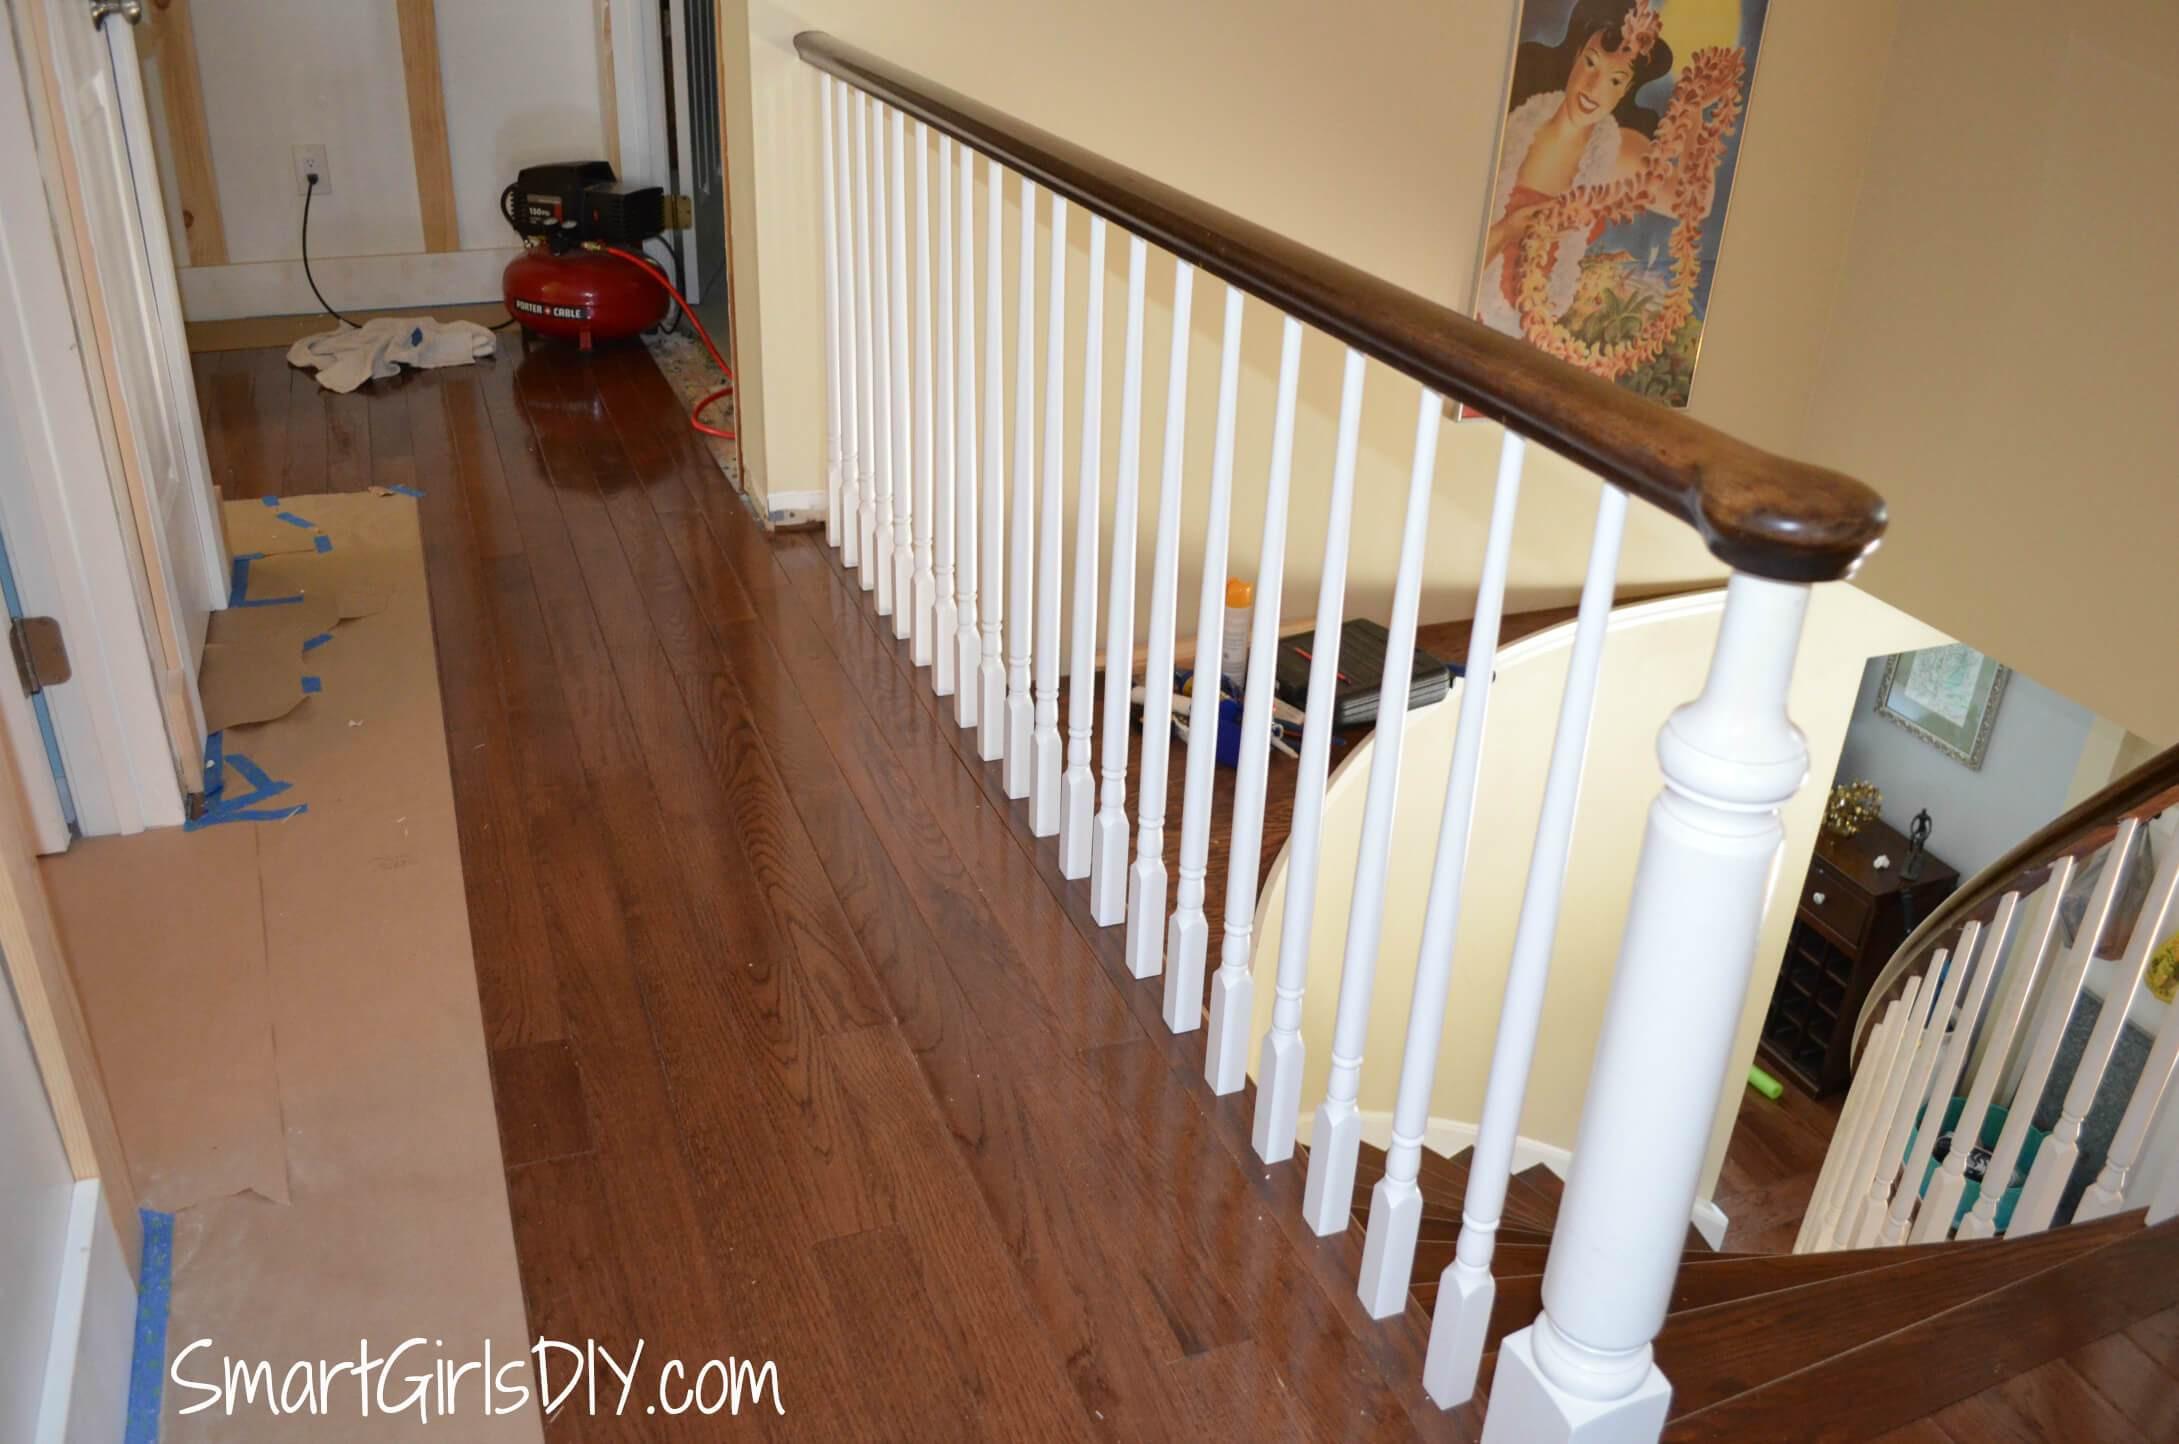 restoring hardwood floors under carpet of upstairs hallway 1 installing hardwood floors with regard to upstairs hallway 2 hardwood spindles